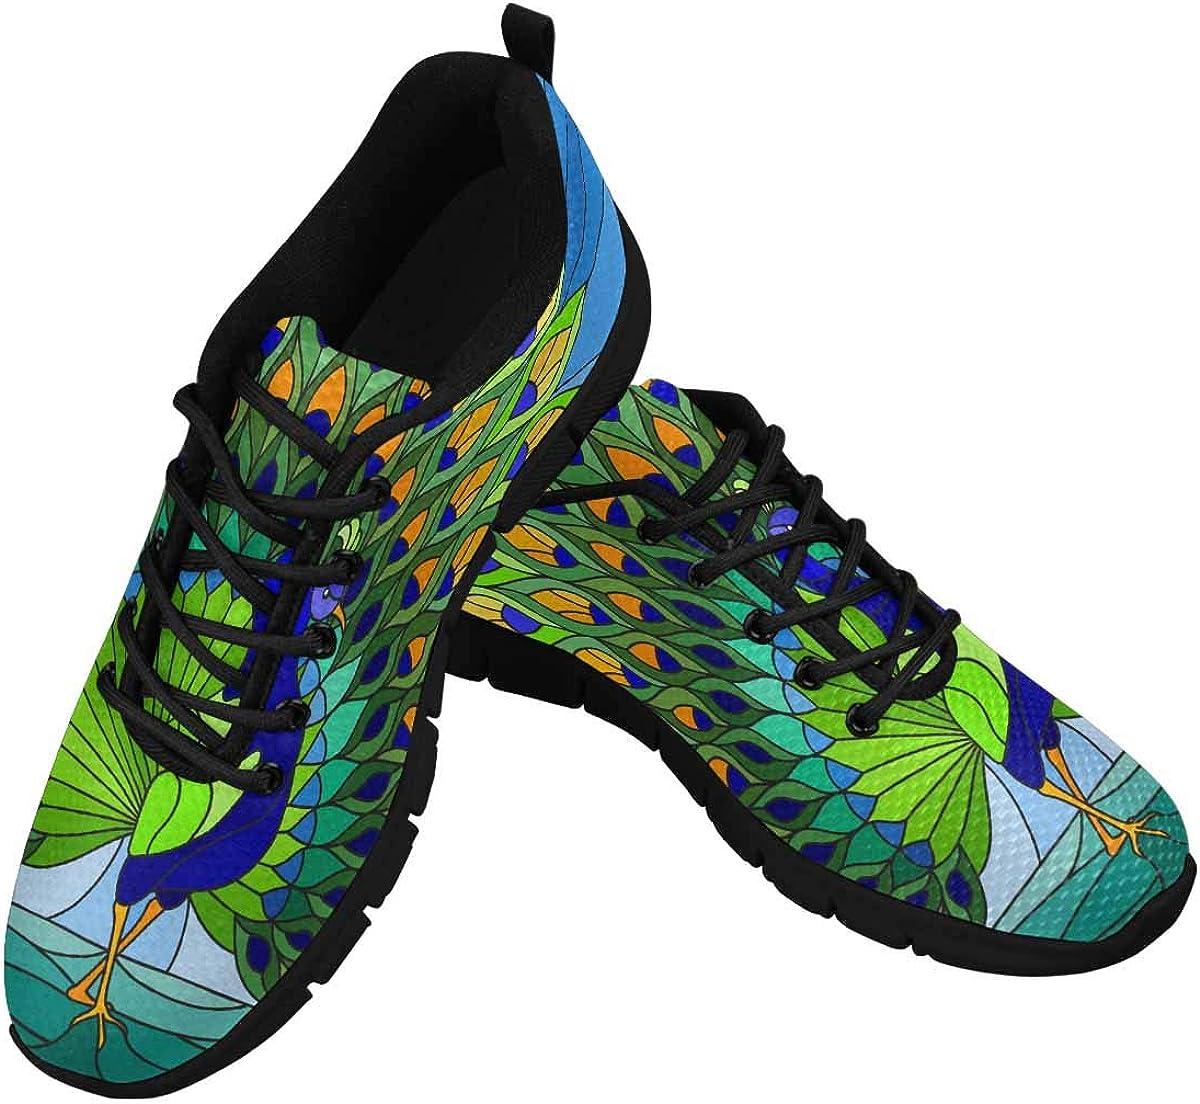 InterestPrint Colorful Peacock Women's Tennis Running Shoes Lightweight Sneakers